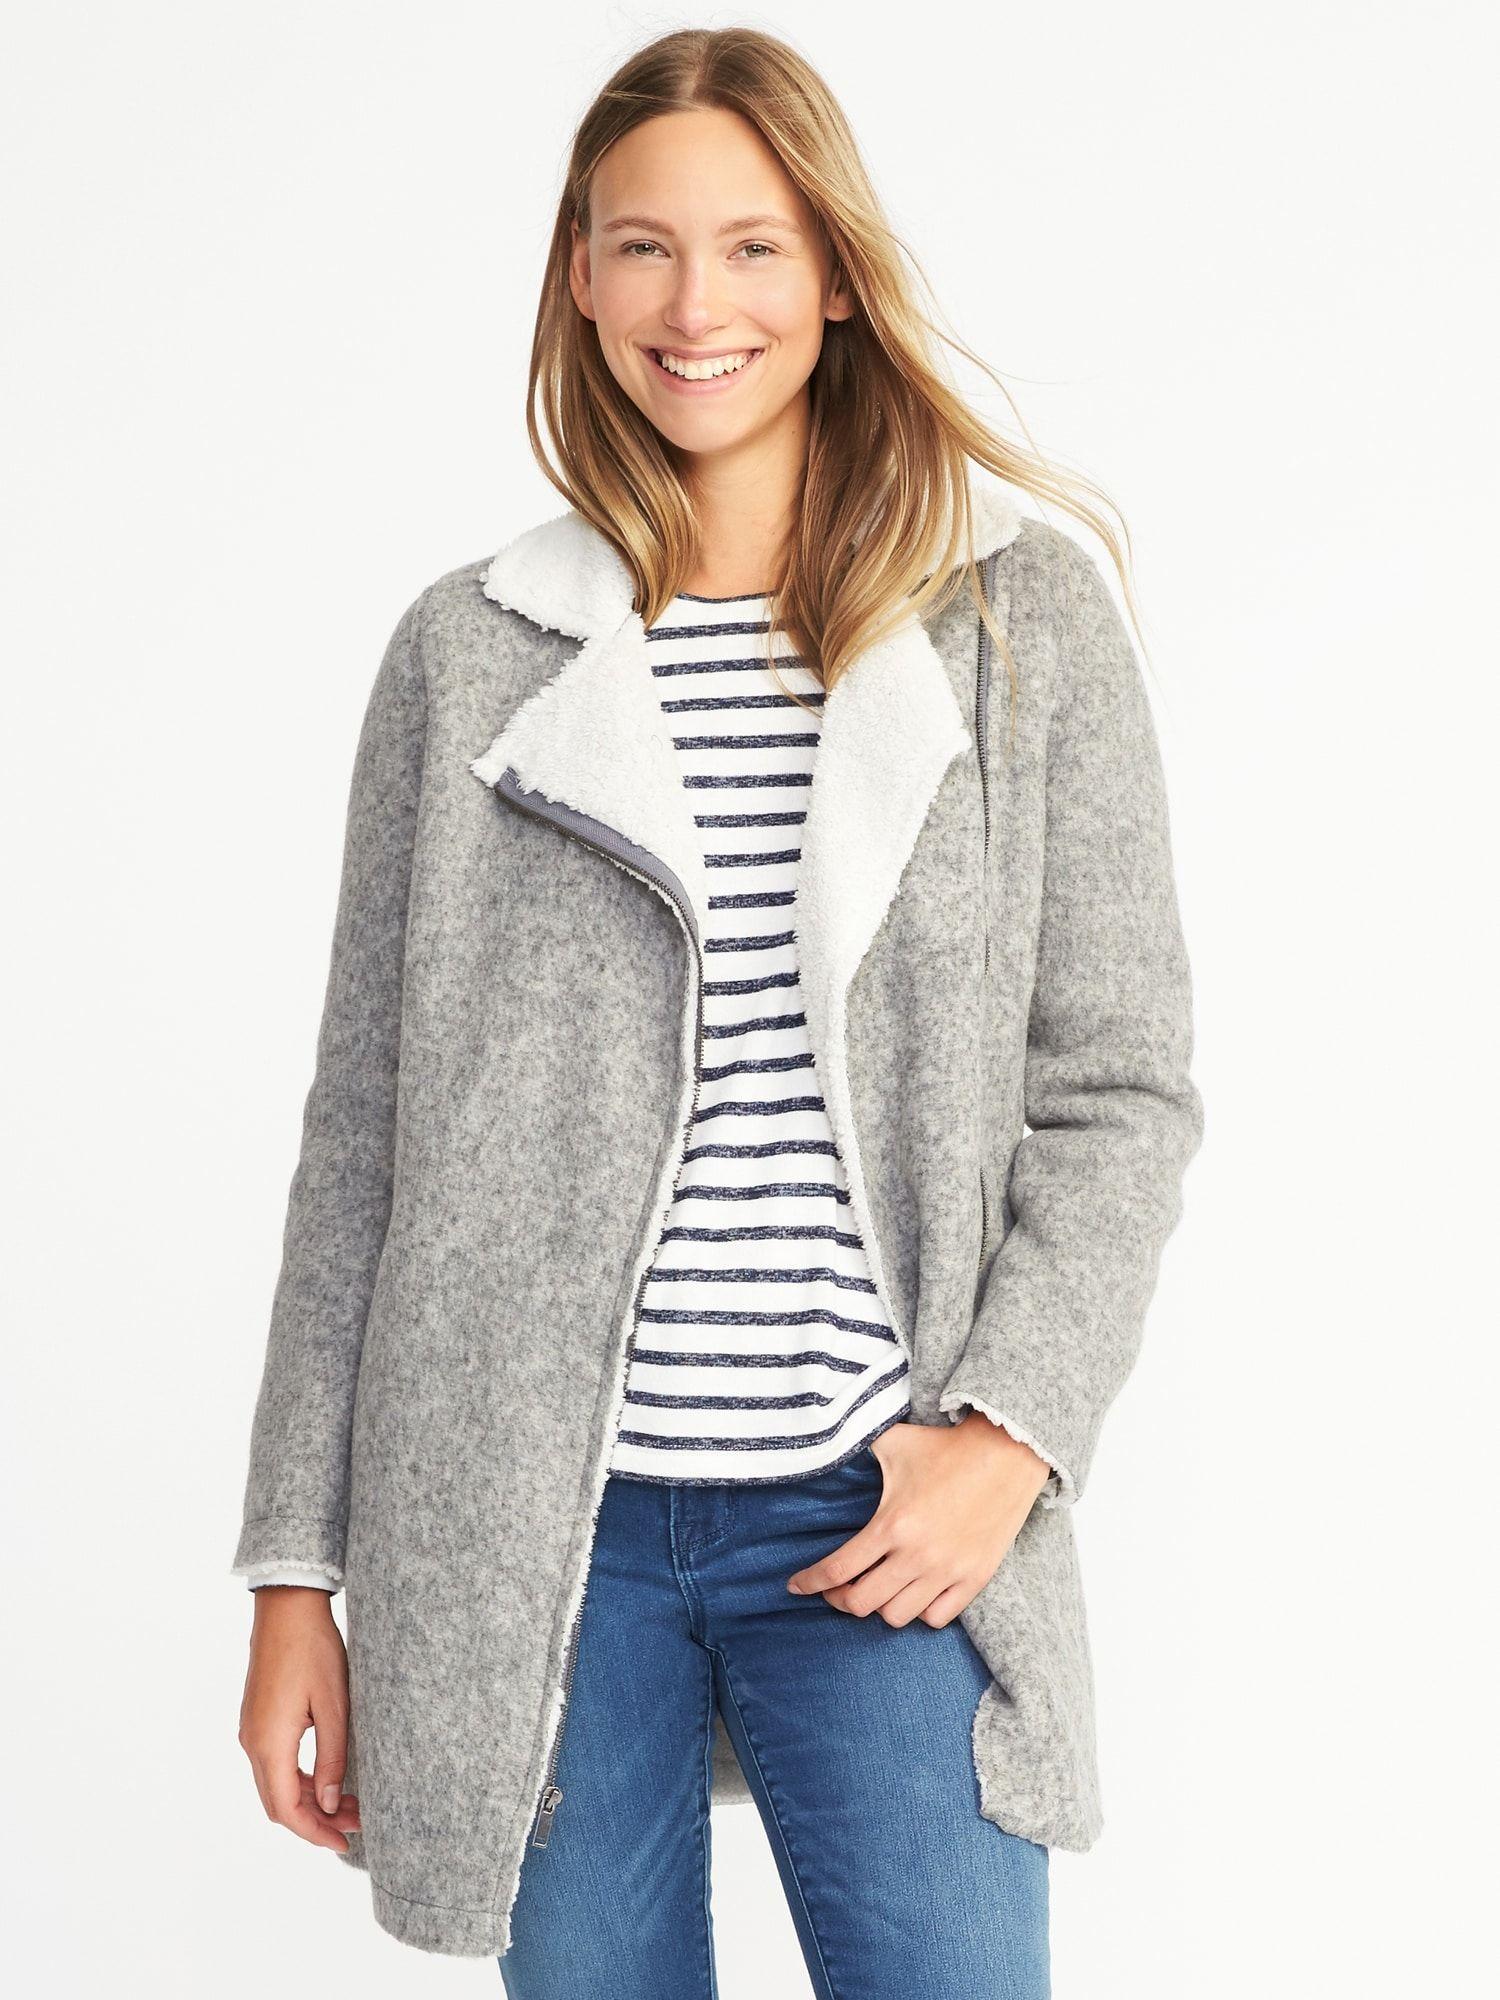 Long SherpaLined Moto Jacket for Women Old Navy Coats